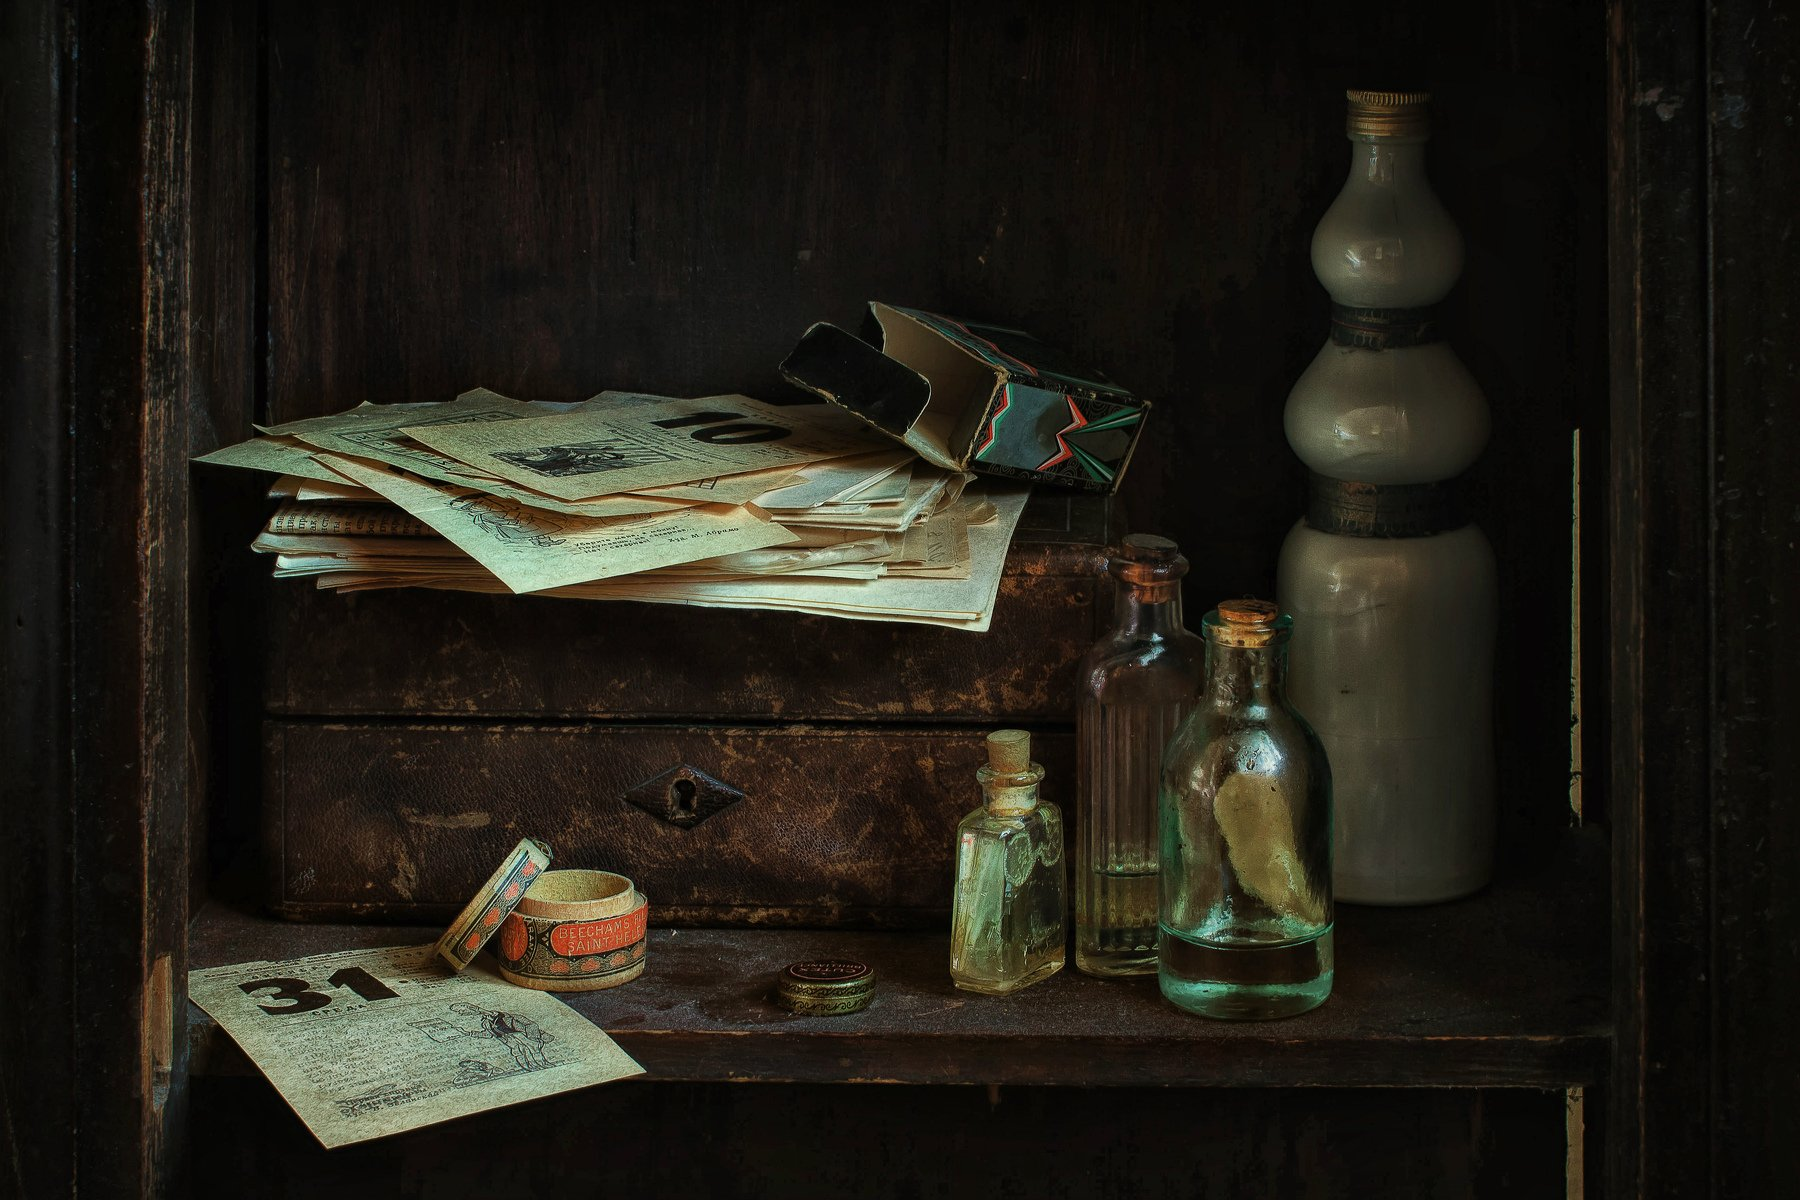 натюрморт, стекло, пузырьки, календарь, Анна Петина